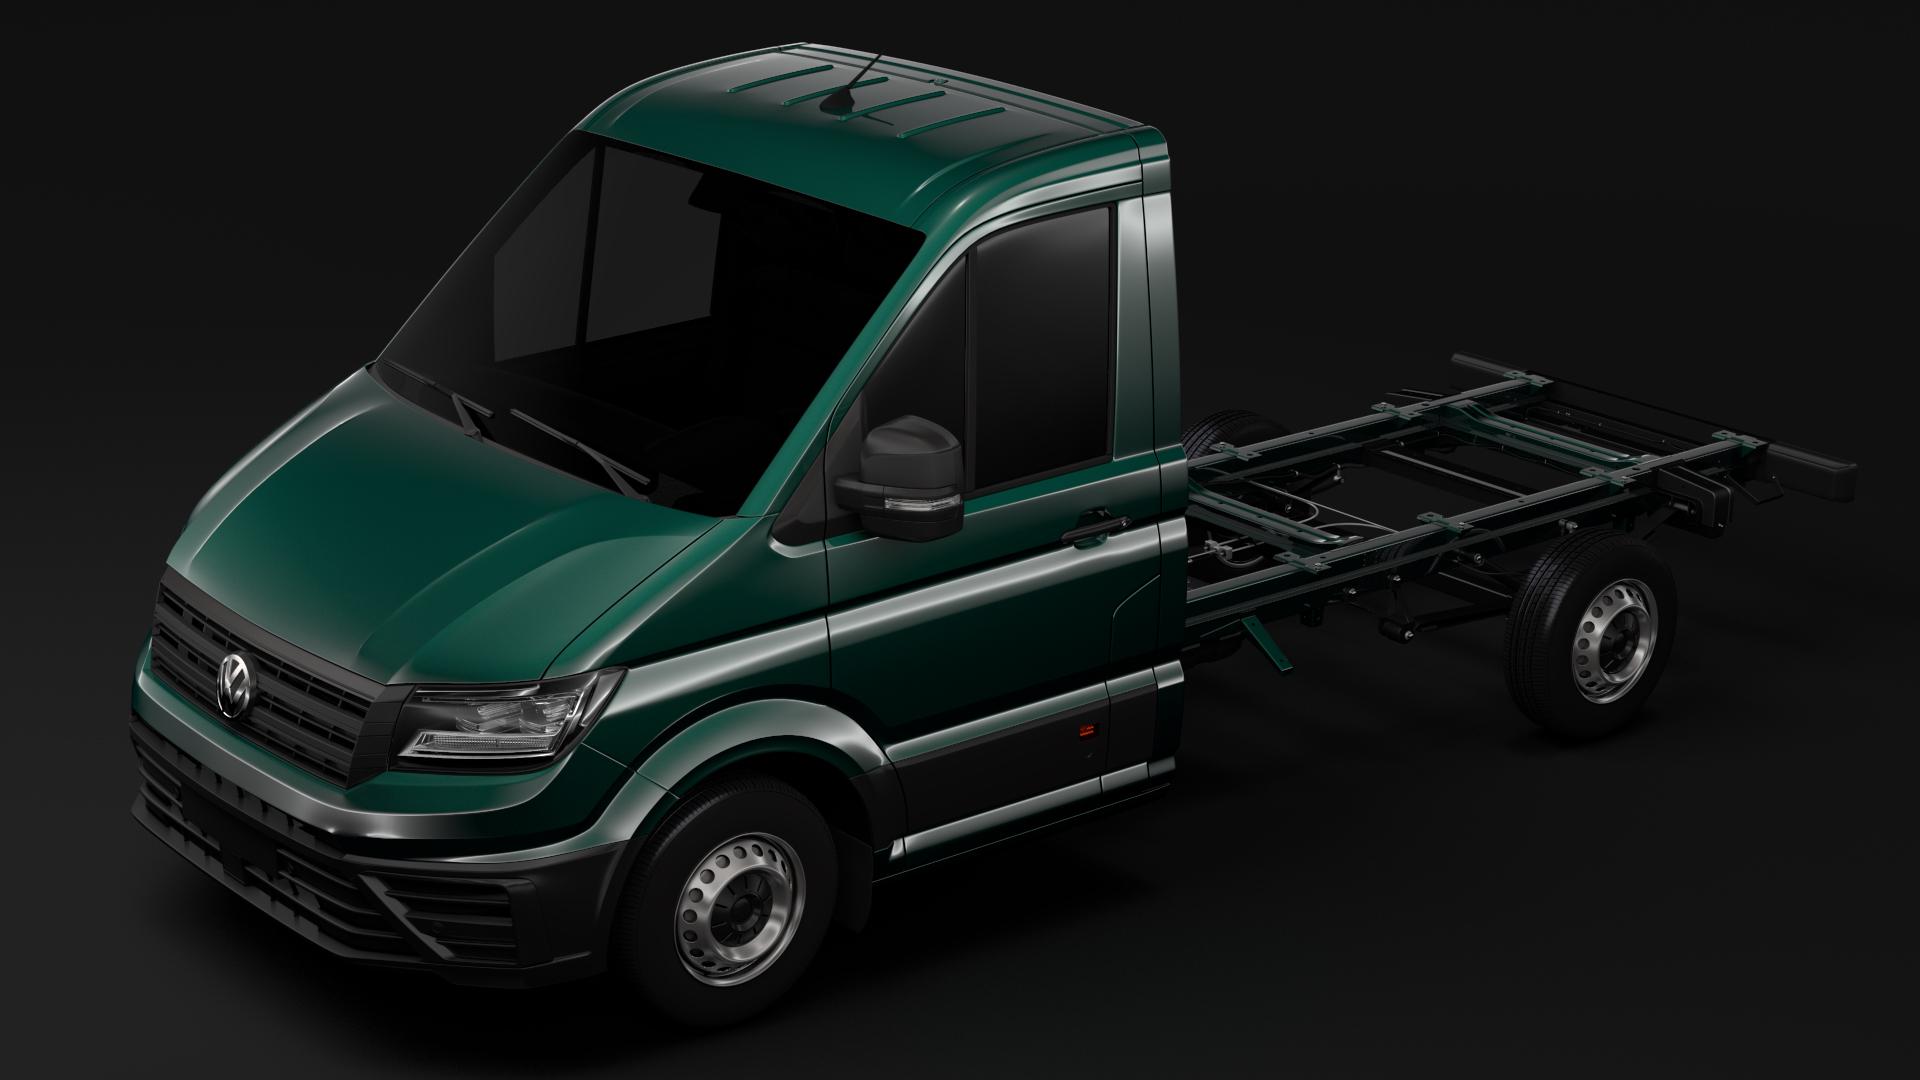 wv crafter chassis single-cab 2017 3d model max fbx c4d lwo ma mb hrc xsi obj 275093